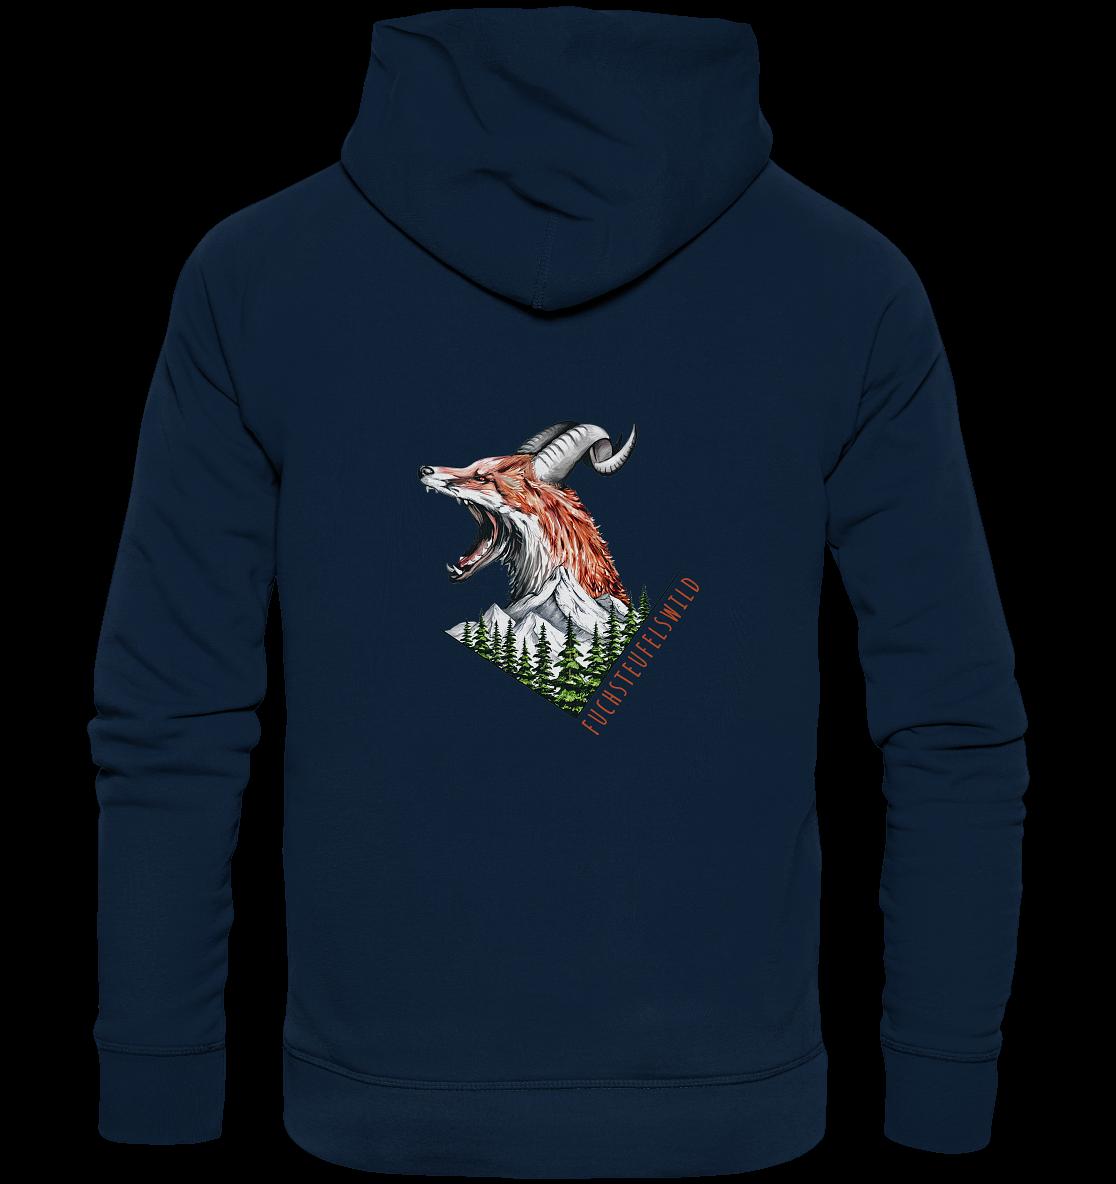 back-organic-hoodie-0e2035-1116x-1.png